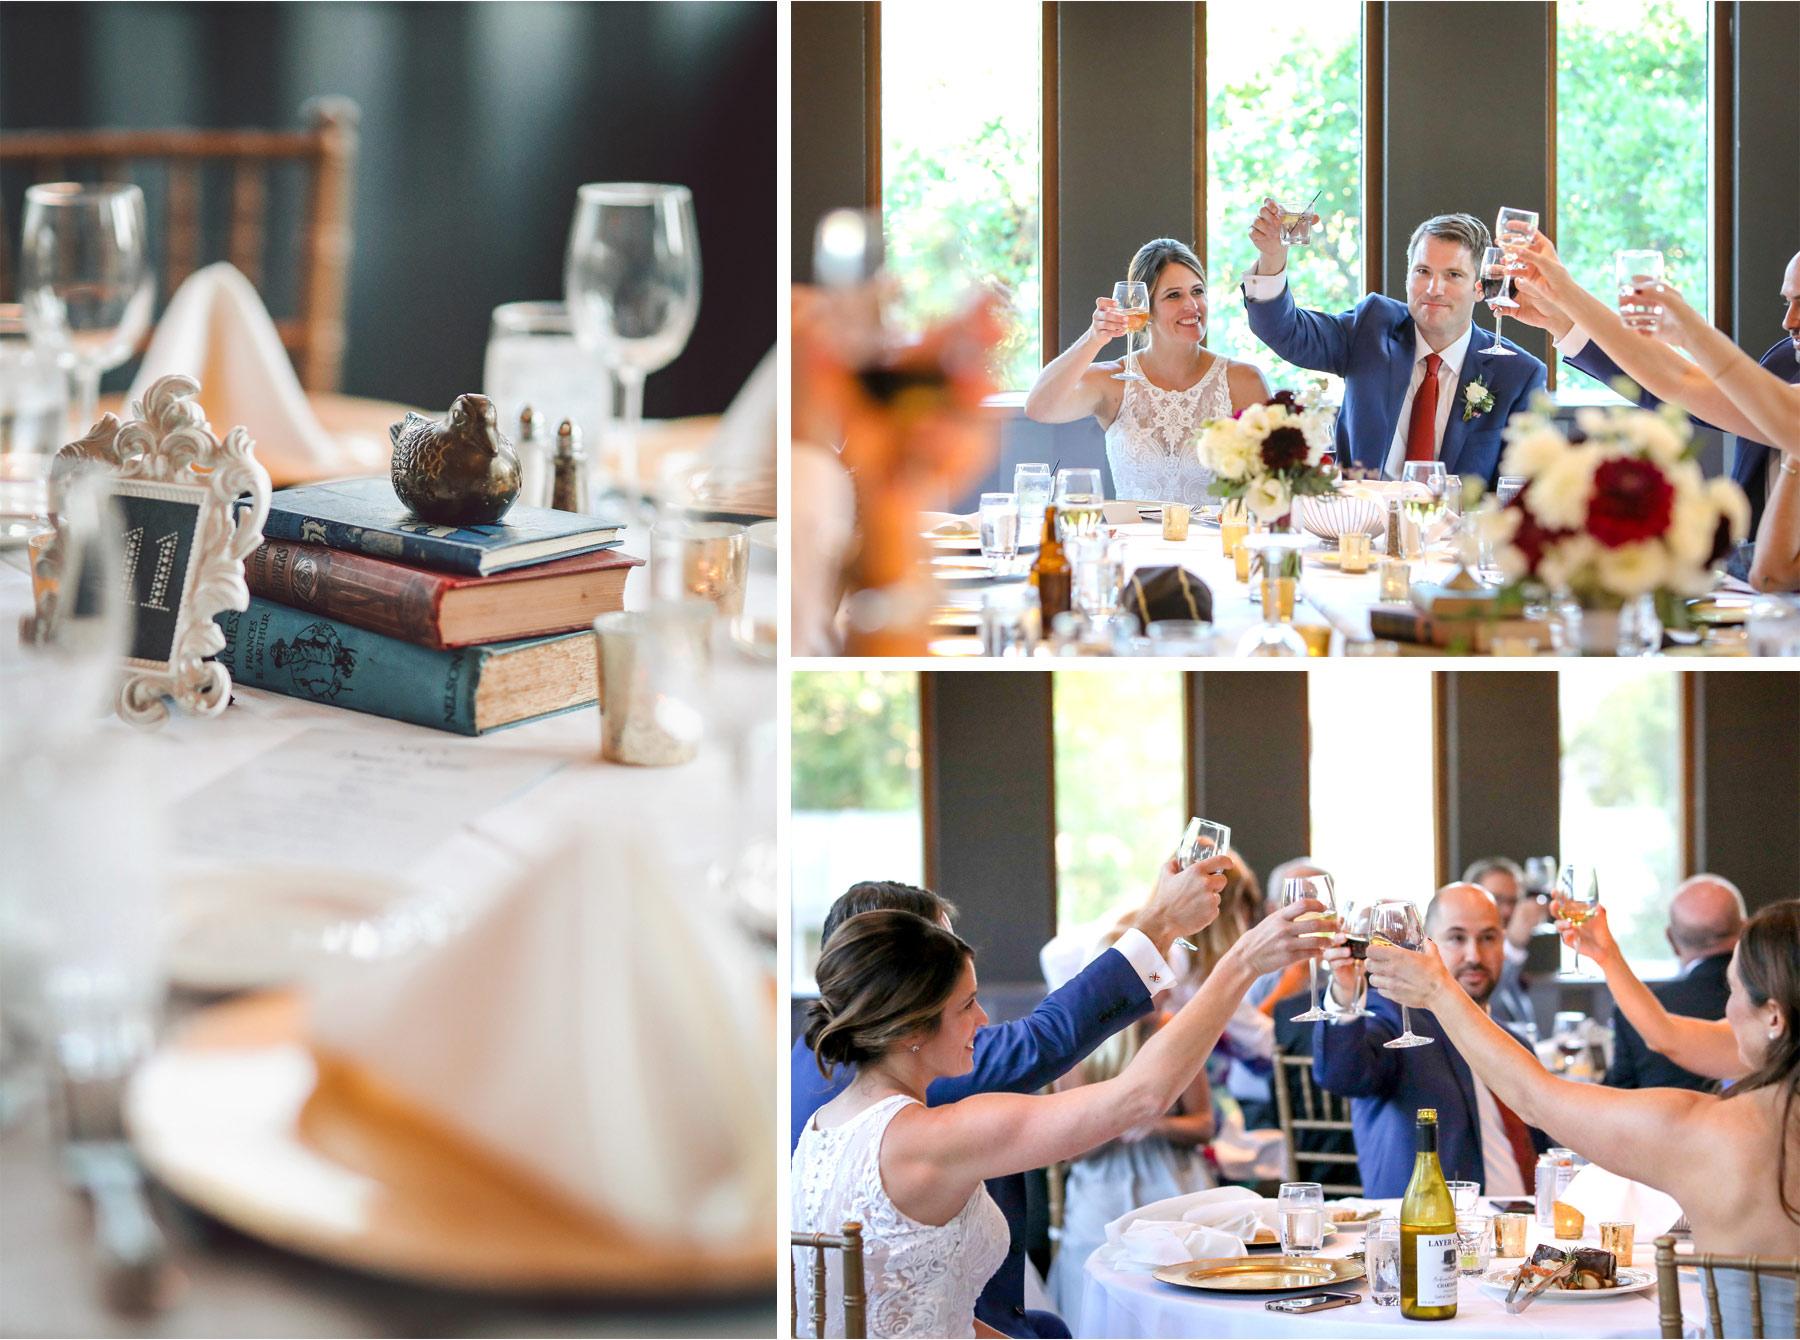 16-Minneapolis-Minnesota-Wedding-Photographer-by-Vick-Photography-Van-Dusen-Mansion-Reception-Decor-Toasts-Megan-and-Ned.jpg